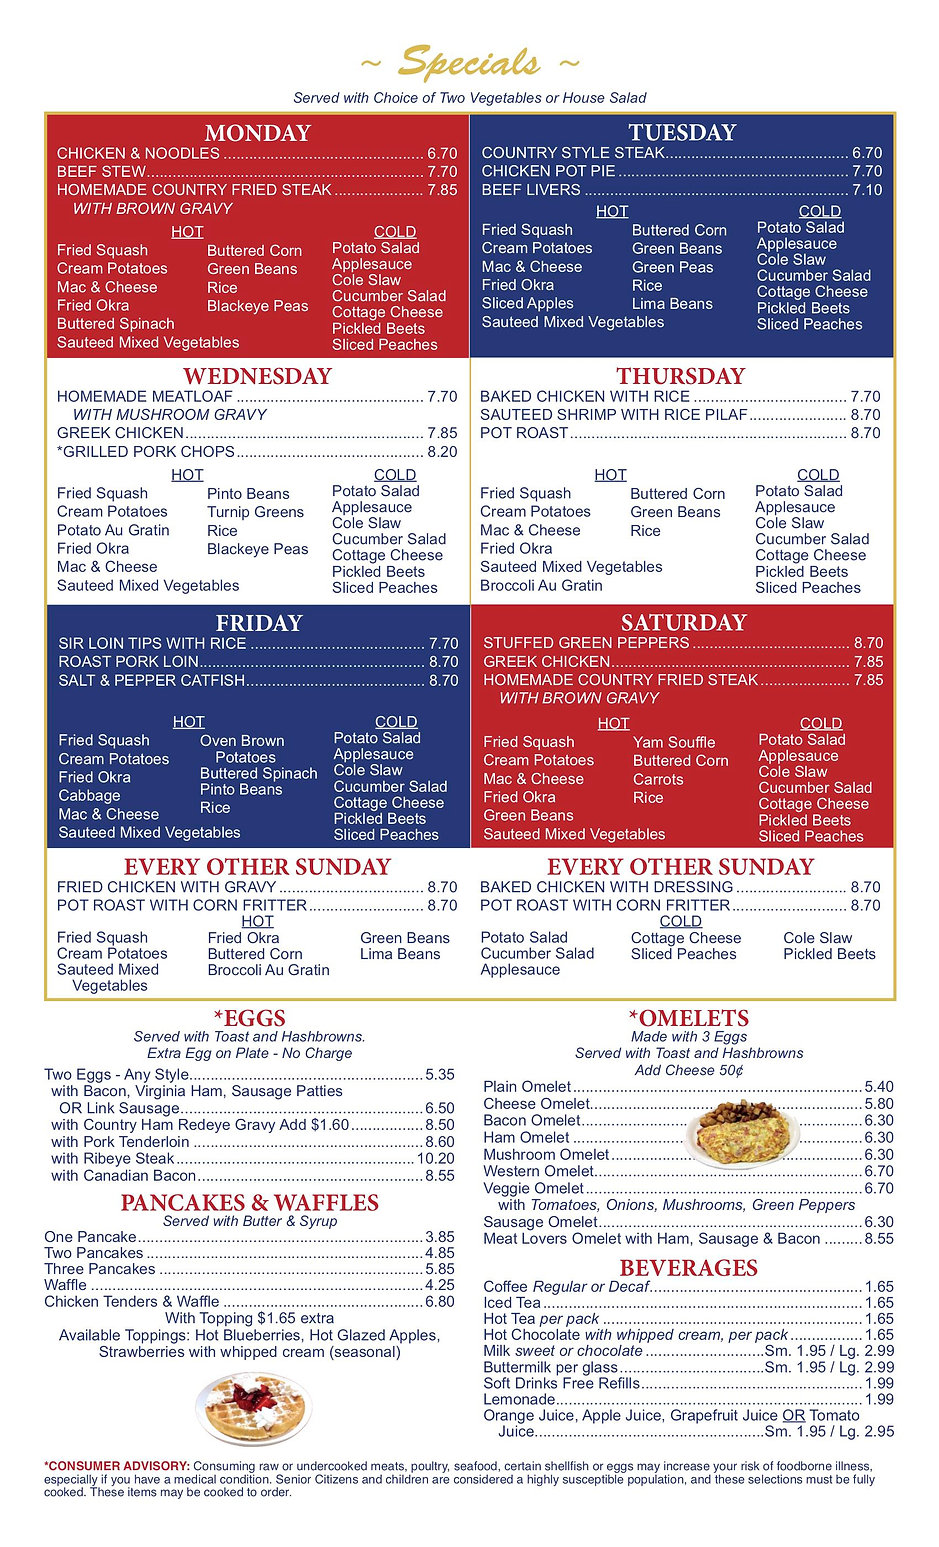 Clemmons Kitchen menu 20204.jpg